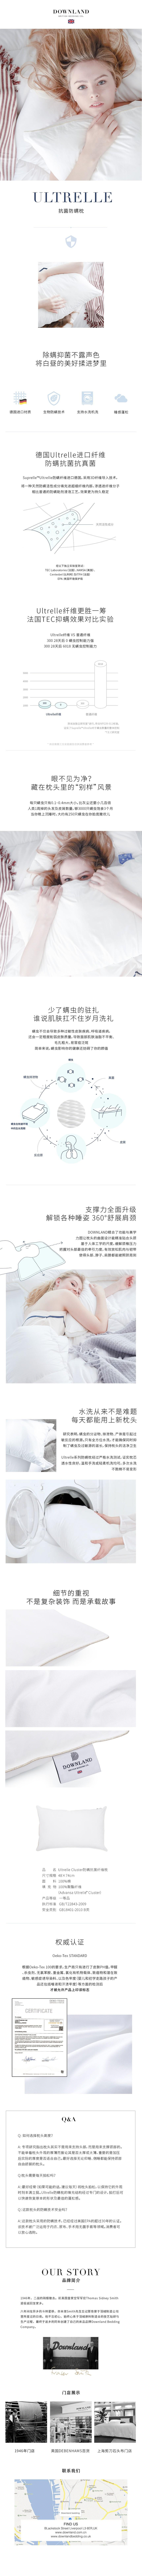 V0426 ultrelle抗菌防螨成人枕-详情页.jpg